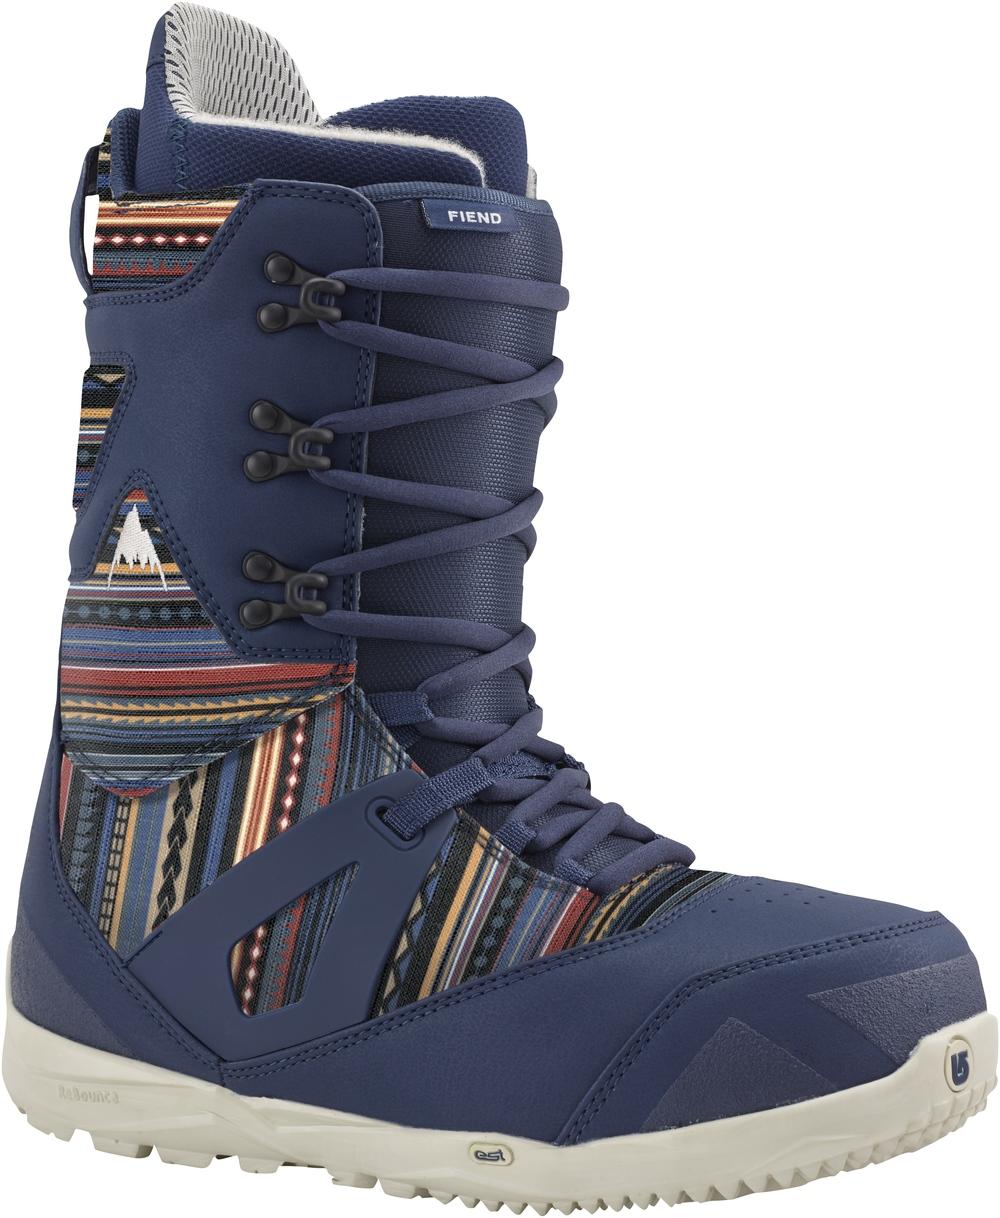 Burton x New Balance Fiend Snowboard Boot, $300